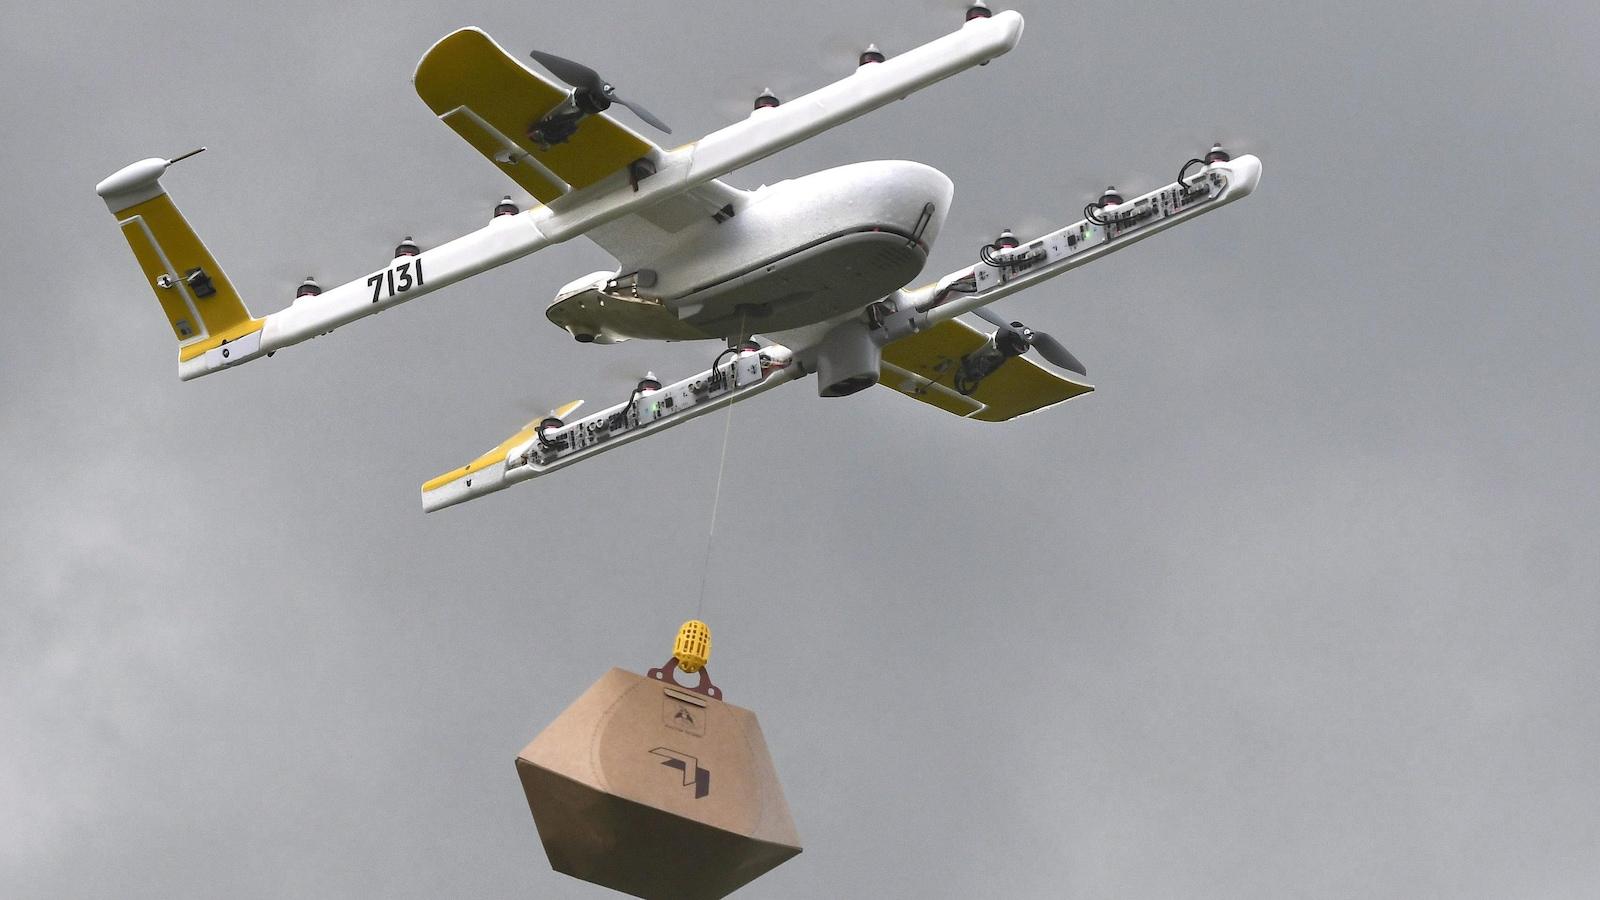 https://images.radio-canada.ca/q_auto,w_1600/v1/ici-info/16x9/wing-drone-livraison-alphabet-google.jpg